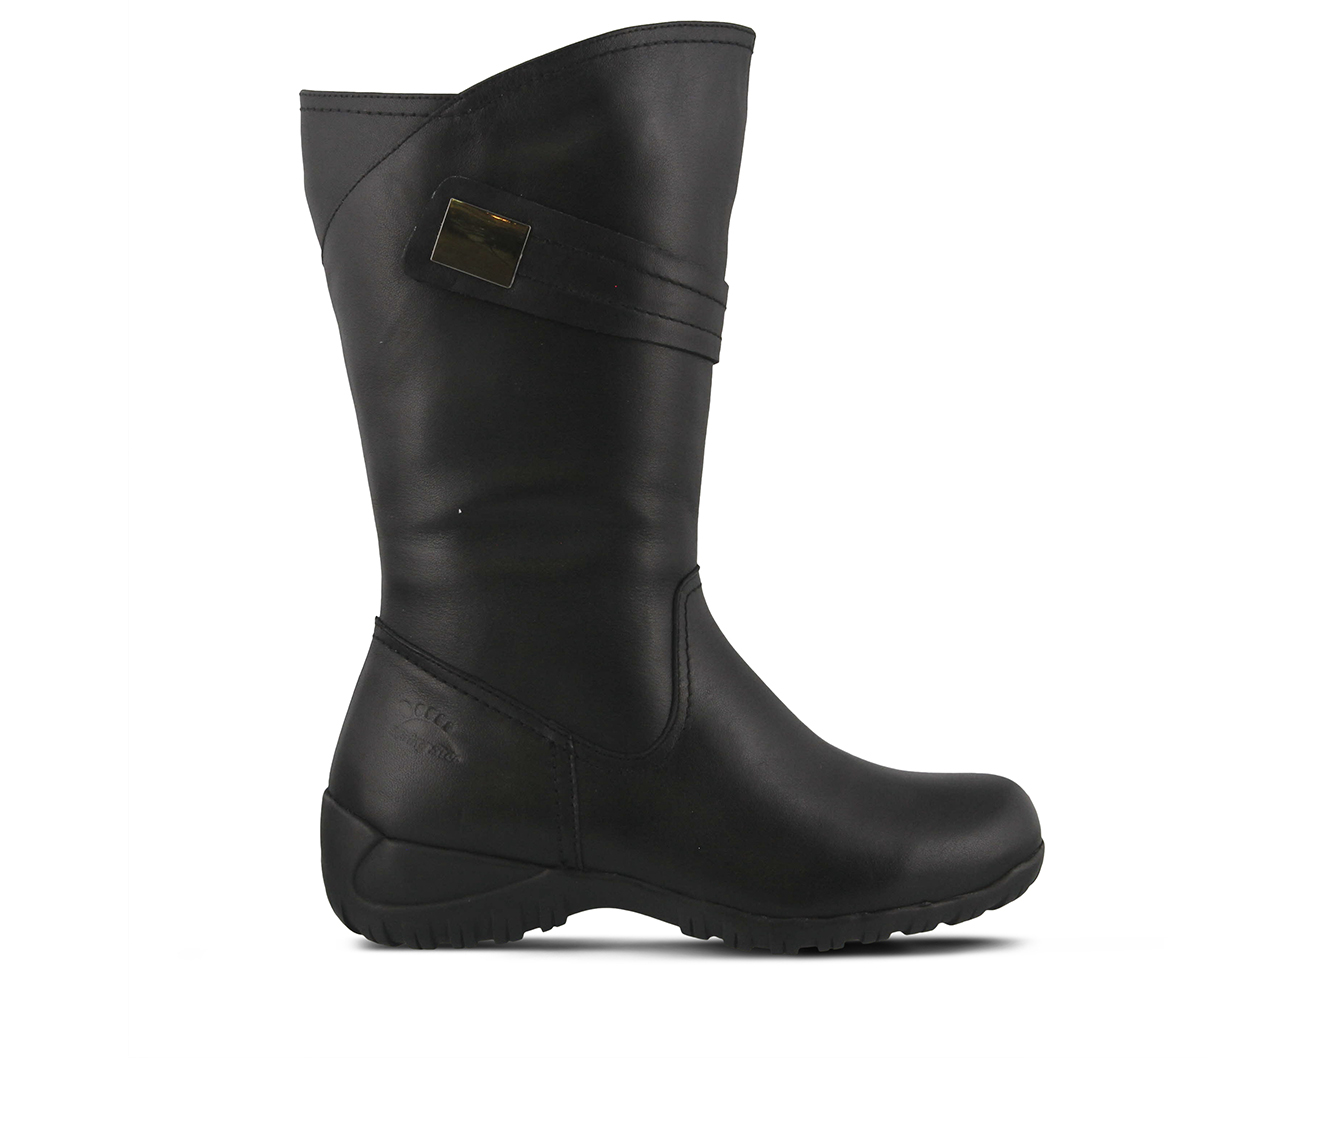 SPRING STEP Bismarck Women's Boots (Black Leather)